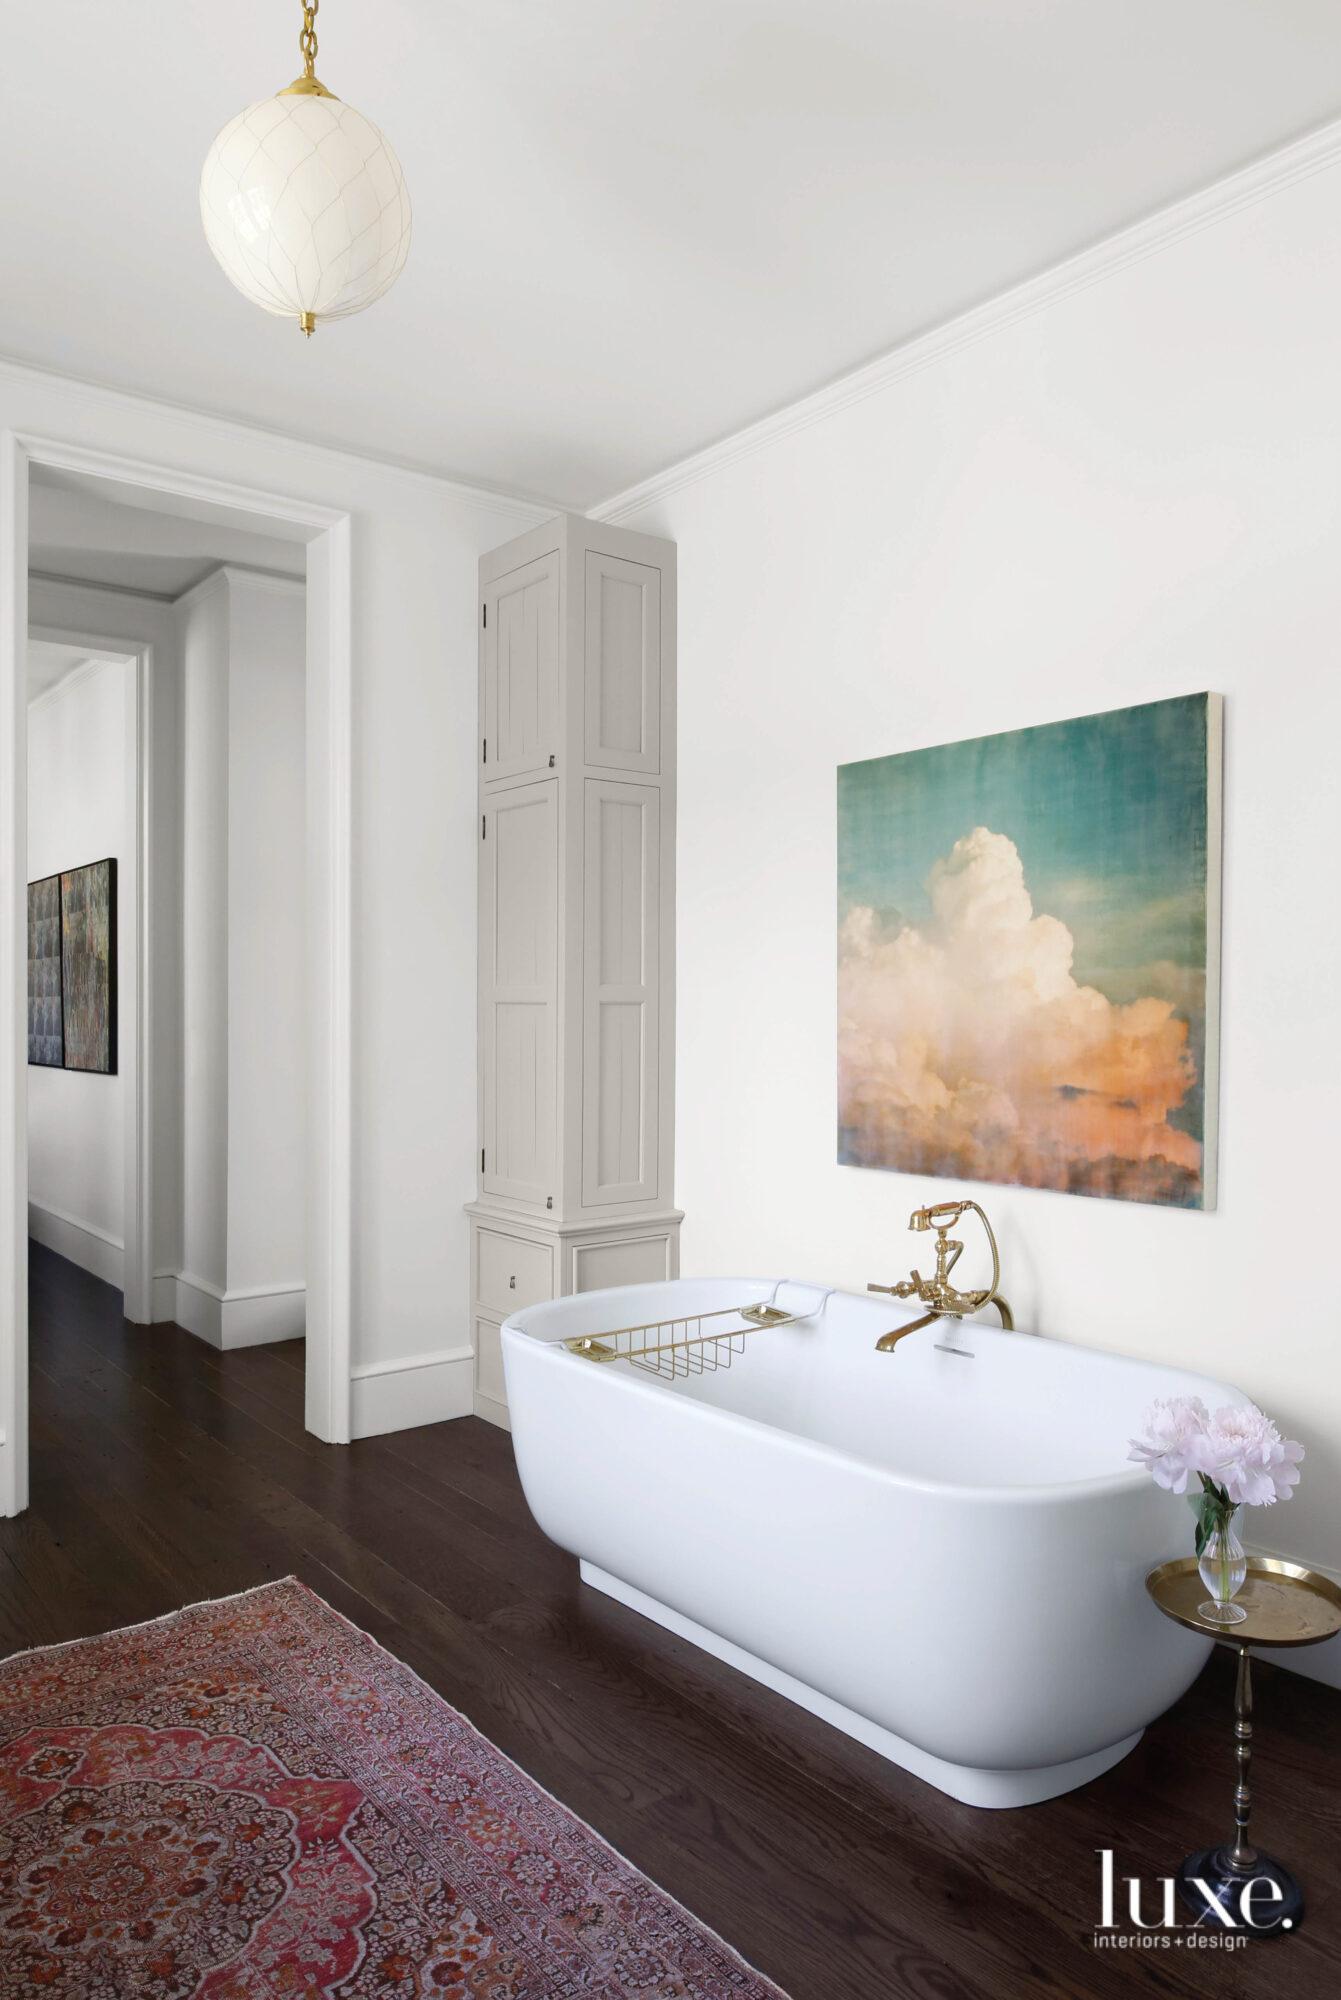 A bathtub, wood floors, pink...